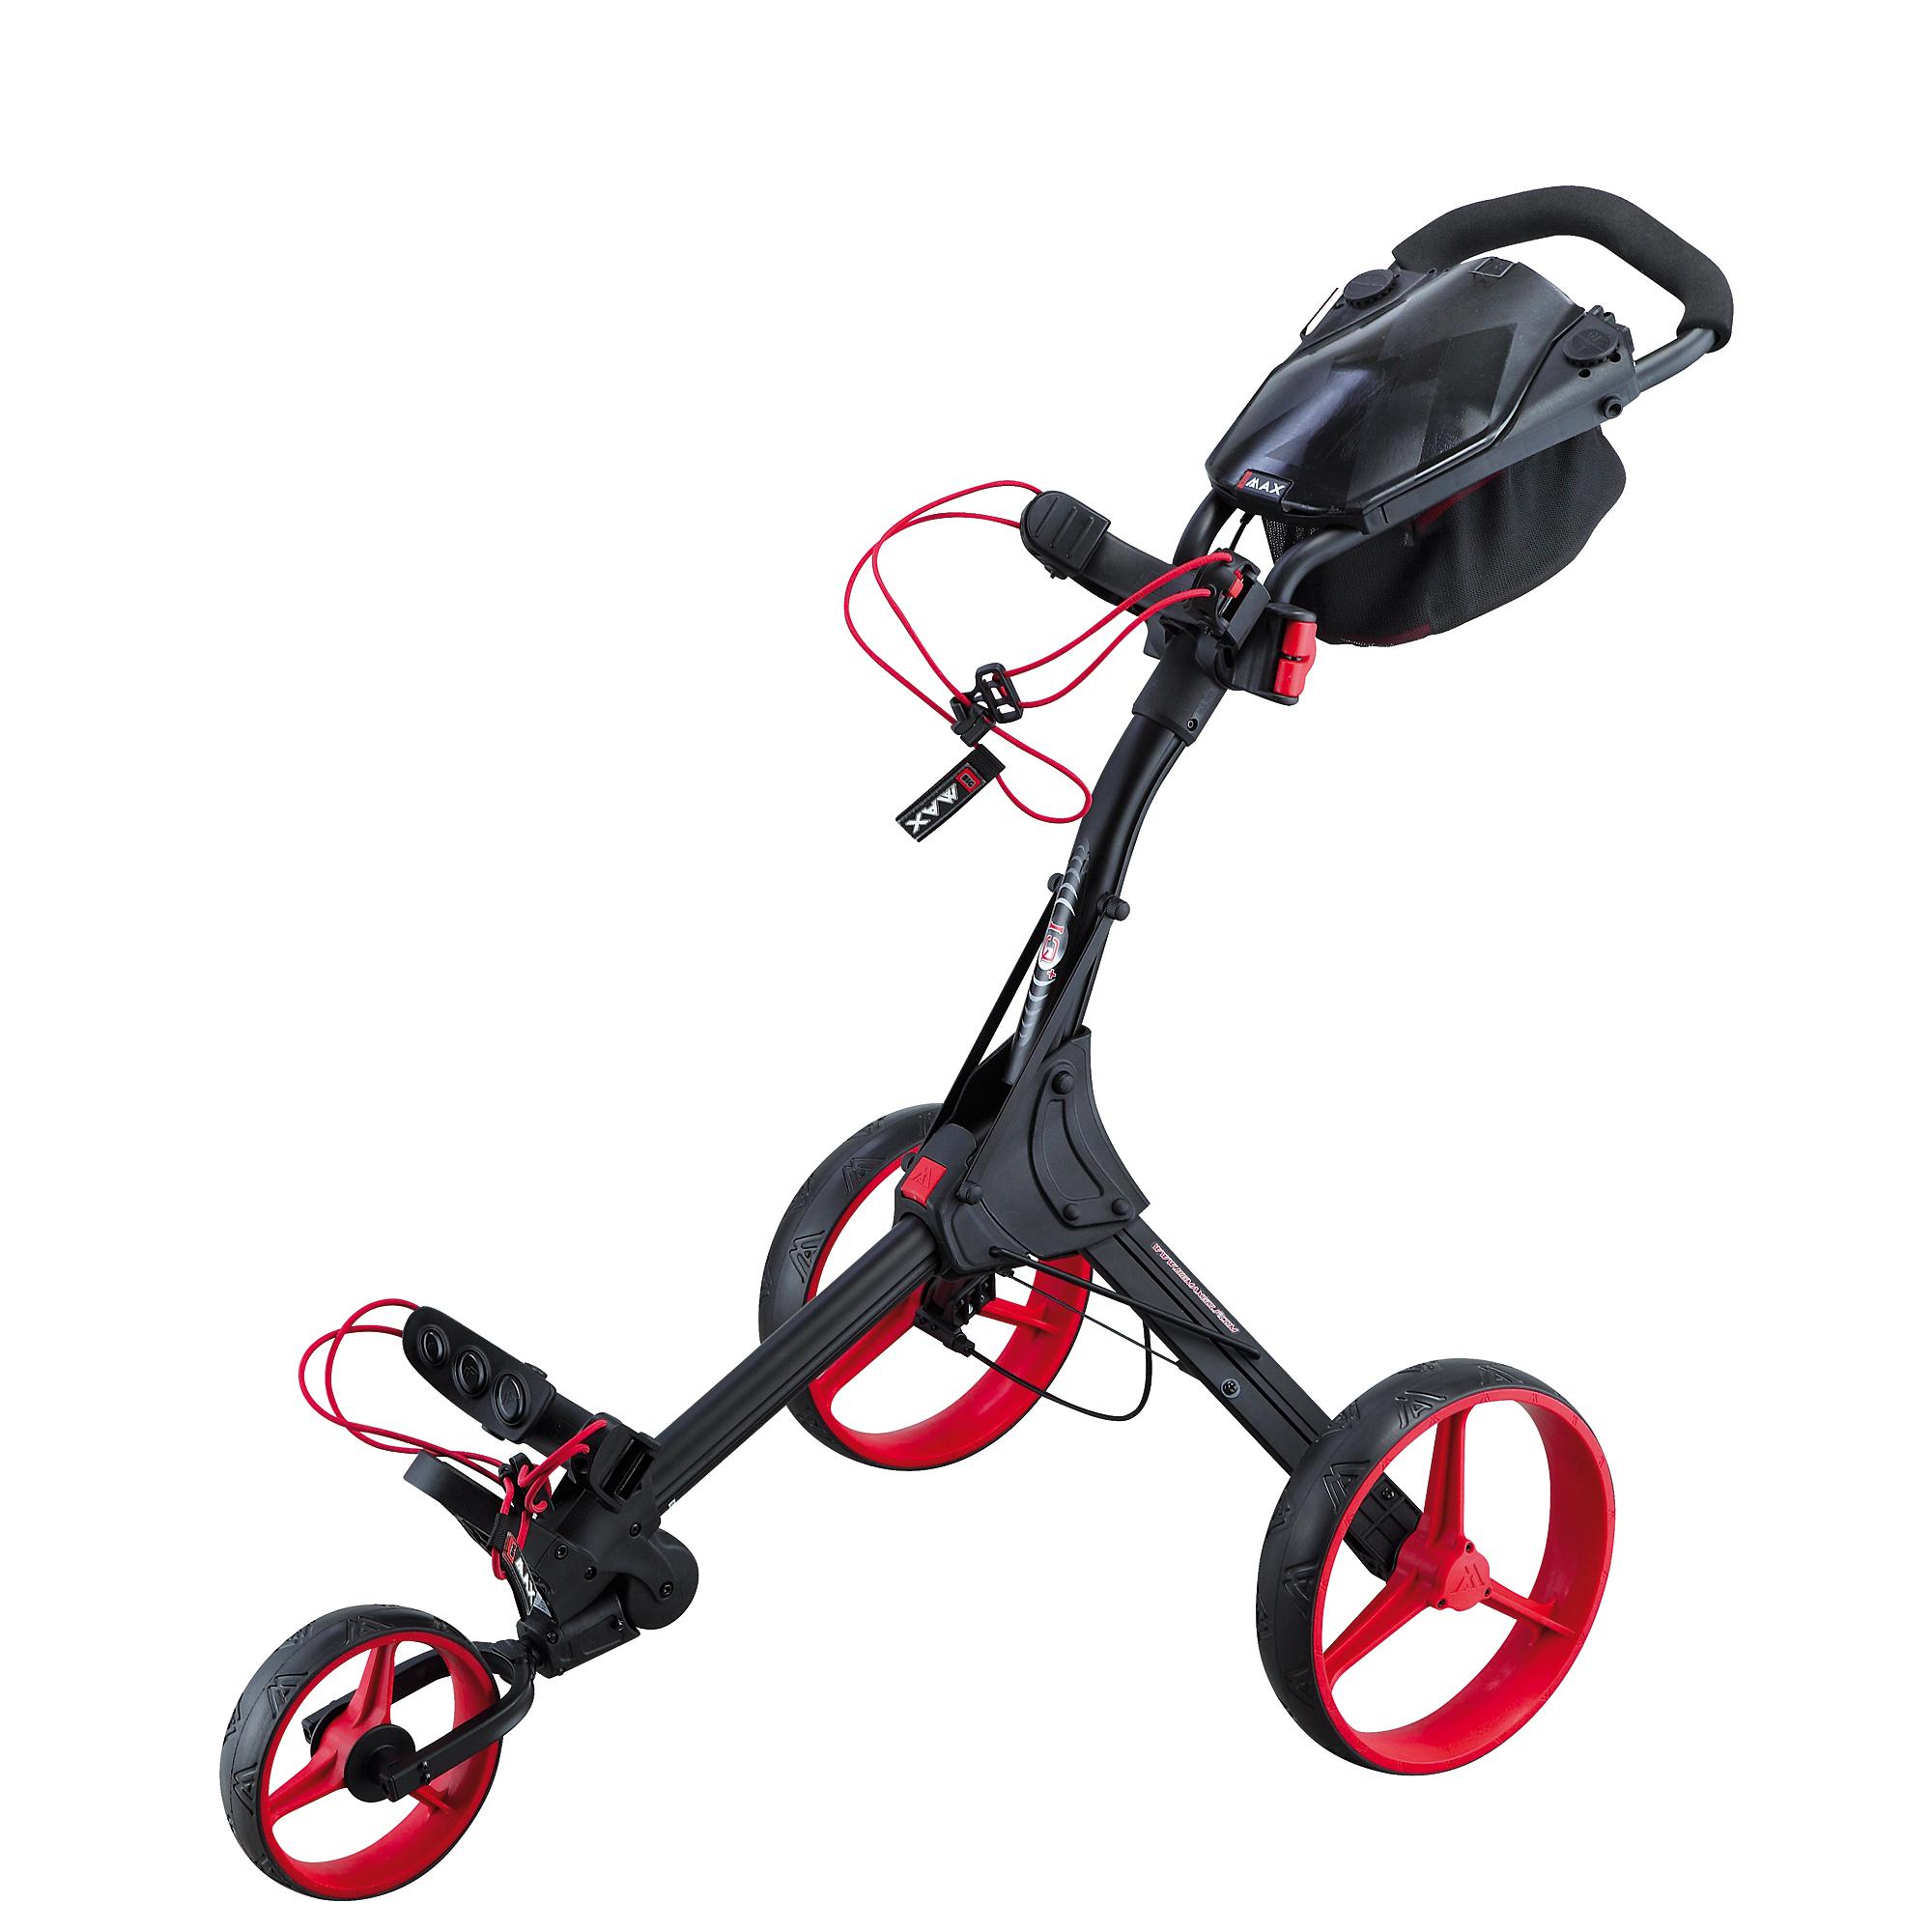 Big Max IQ Plus Golf Trolley – Black/Red